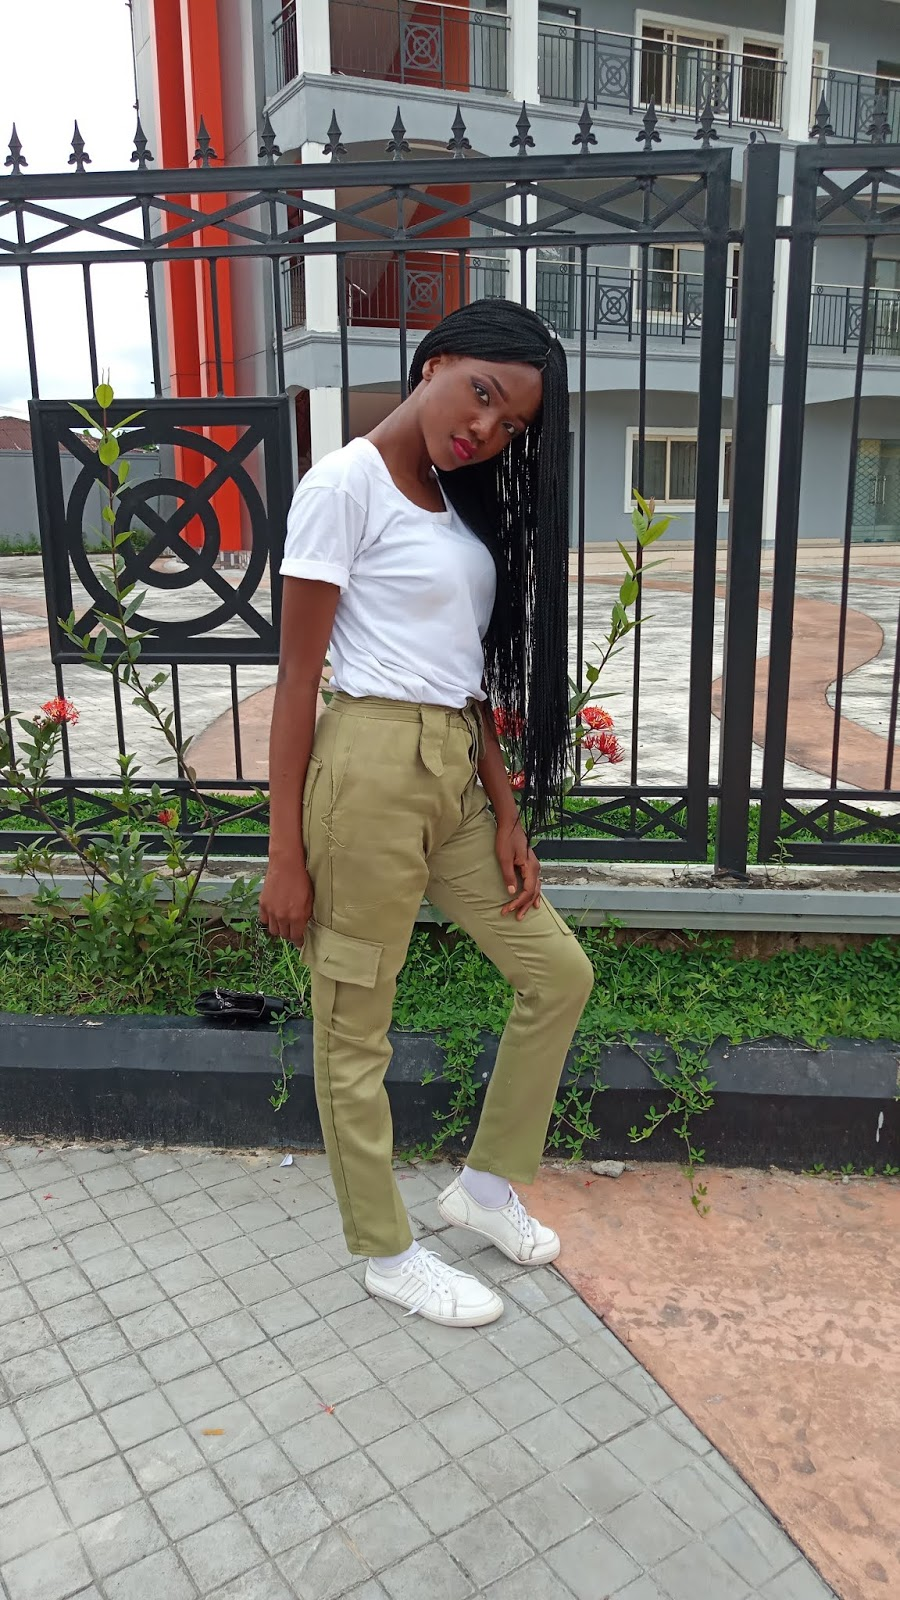 NYSC in Nigeria